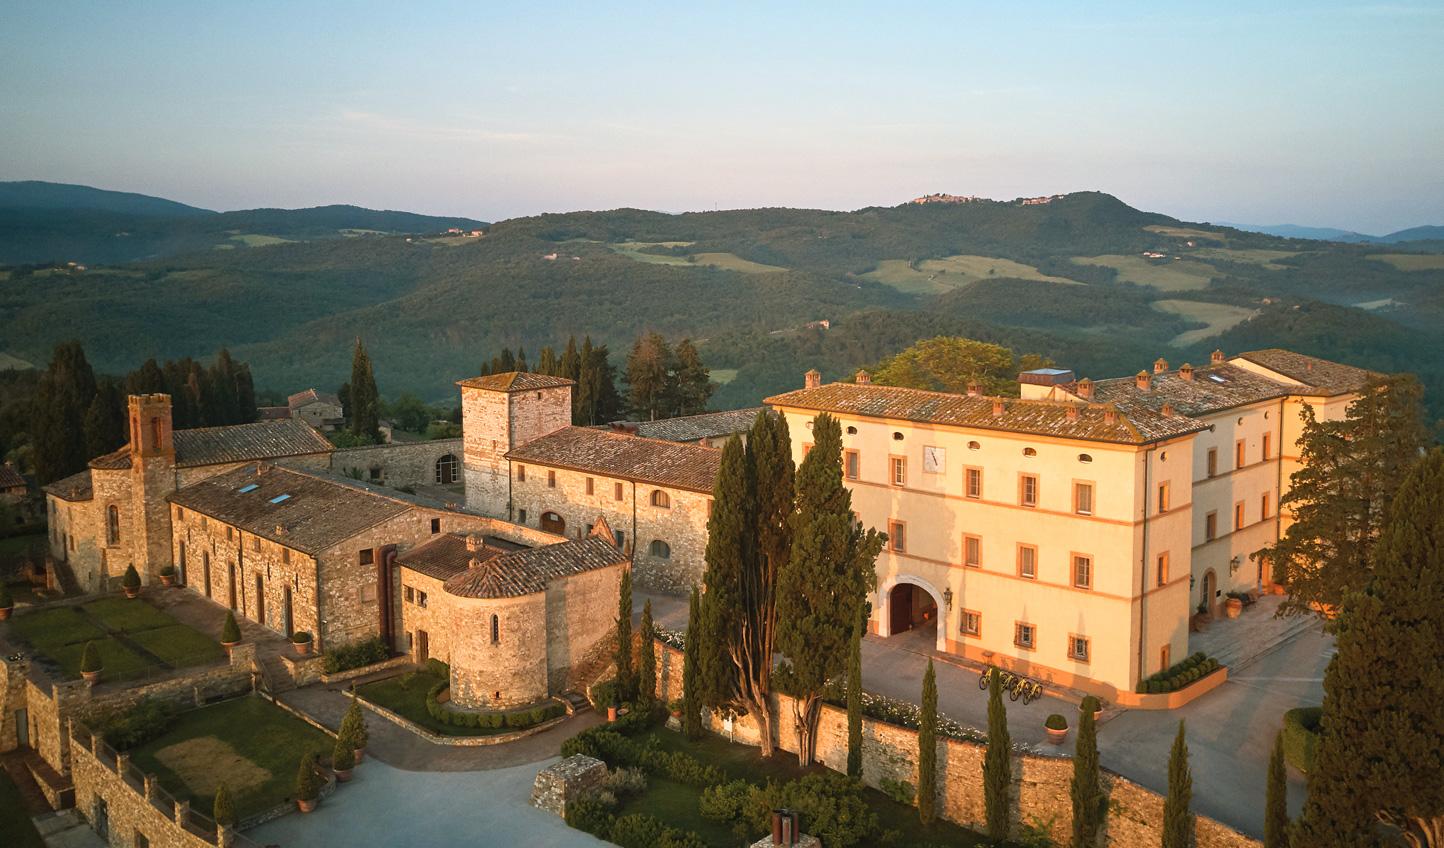 Your Tuscan hideaway awaits